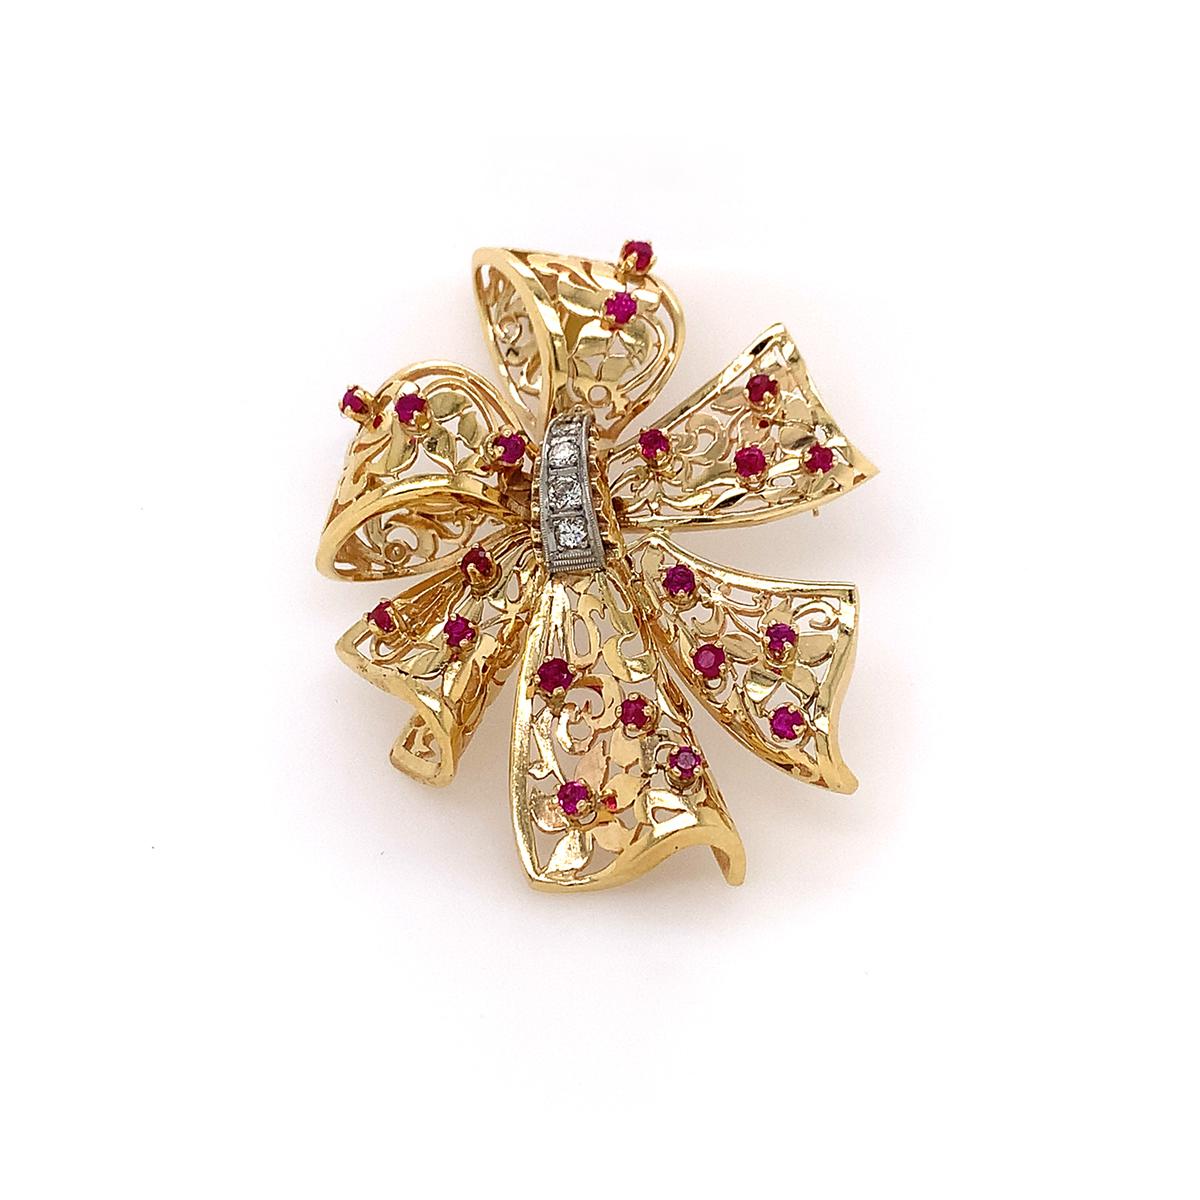 Vintage 14 Karat Yellow Gold Ruby and Diamond Bow Pin Pendant